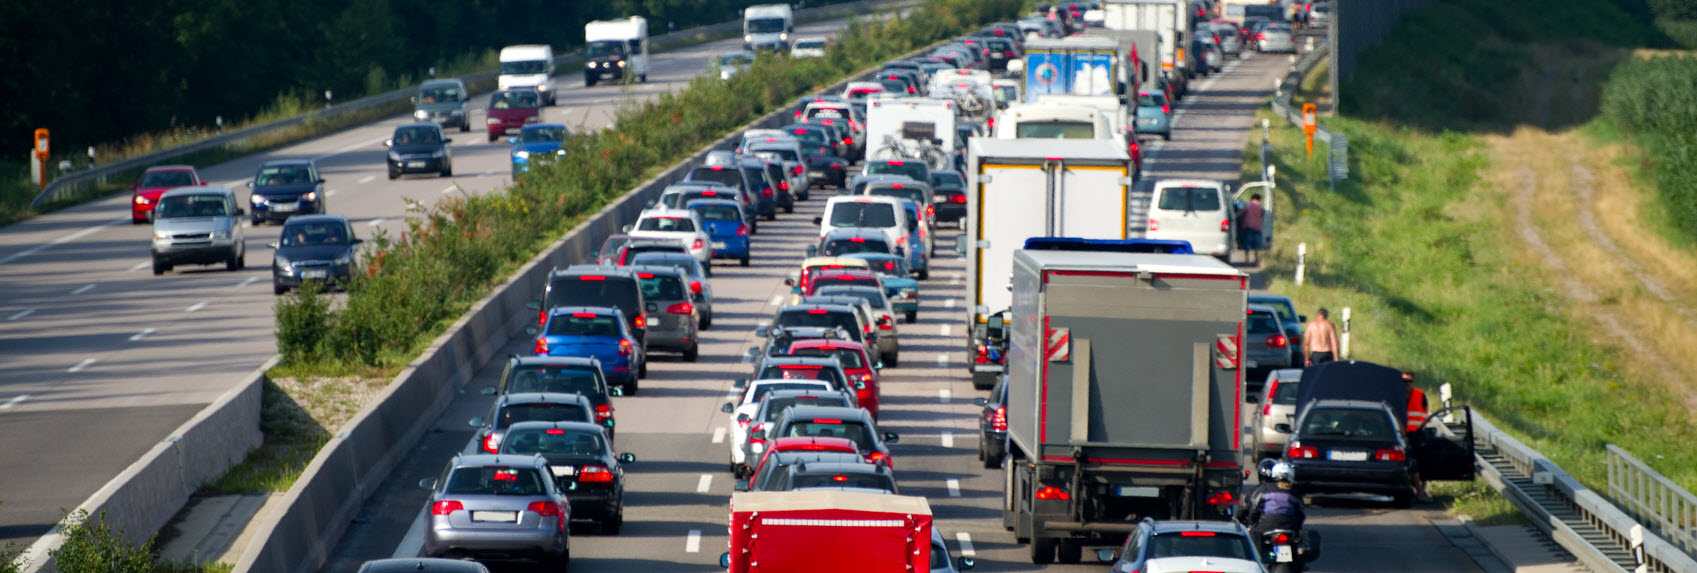 traffic-cars-jam